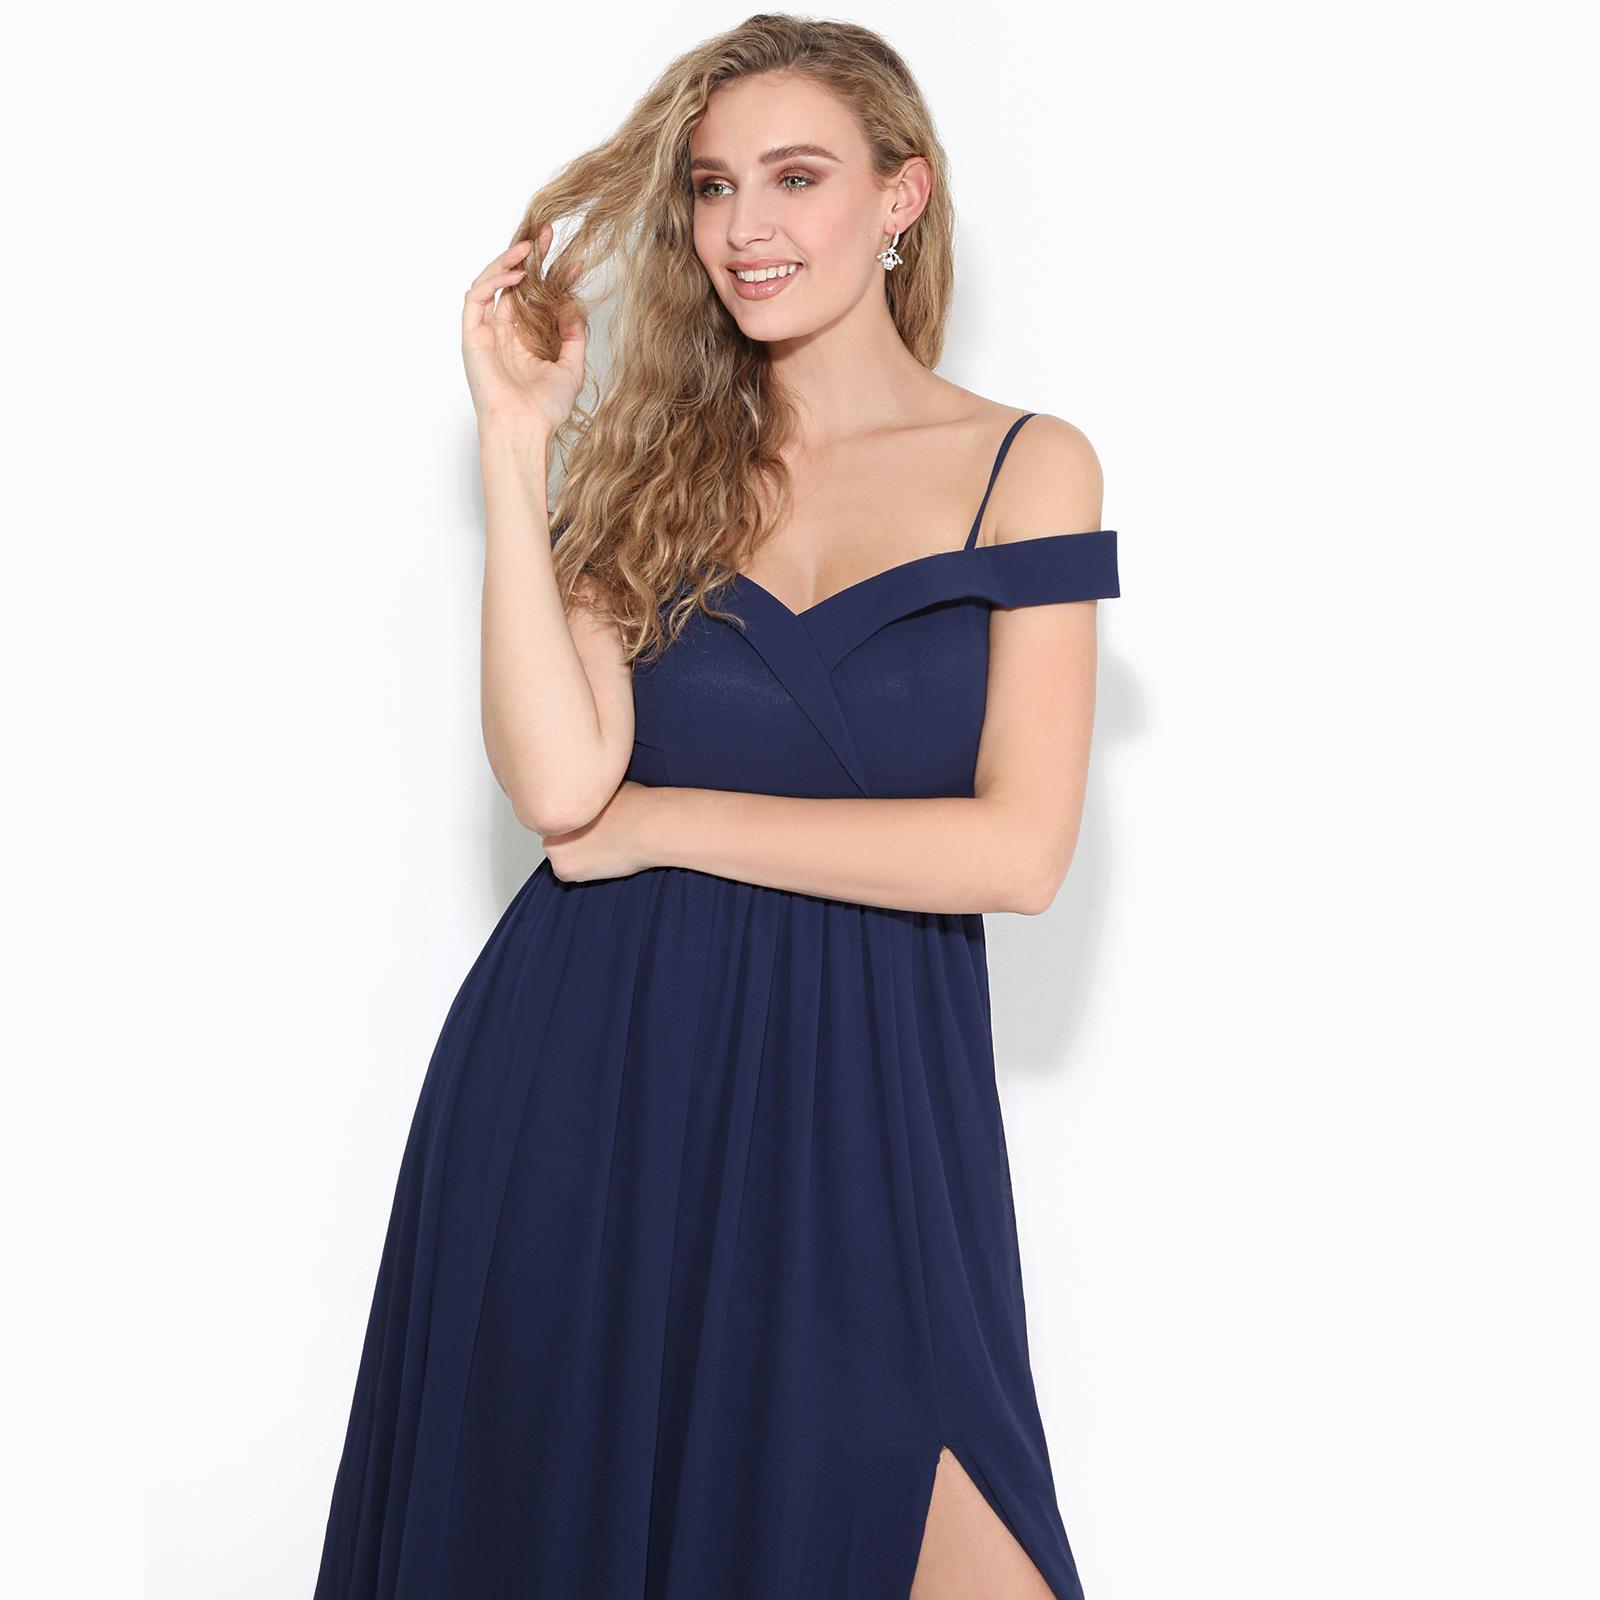 Womens-Ladies-Off-Shoulder-Formal-Maxi-Dress-Slit-Split-Long-Gown-Wedding-Party thumbnail 9